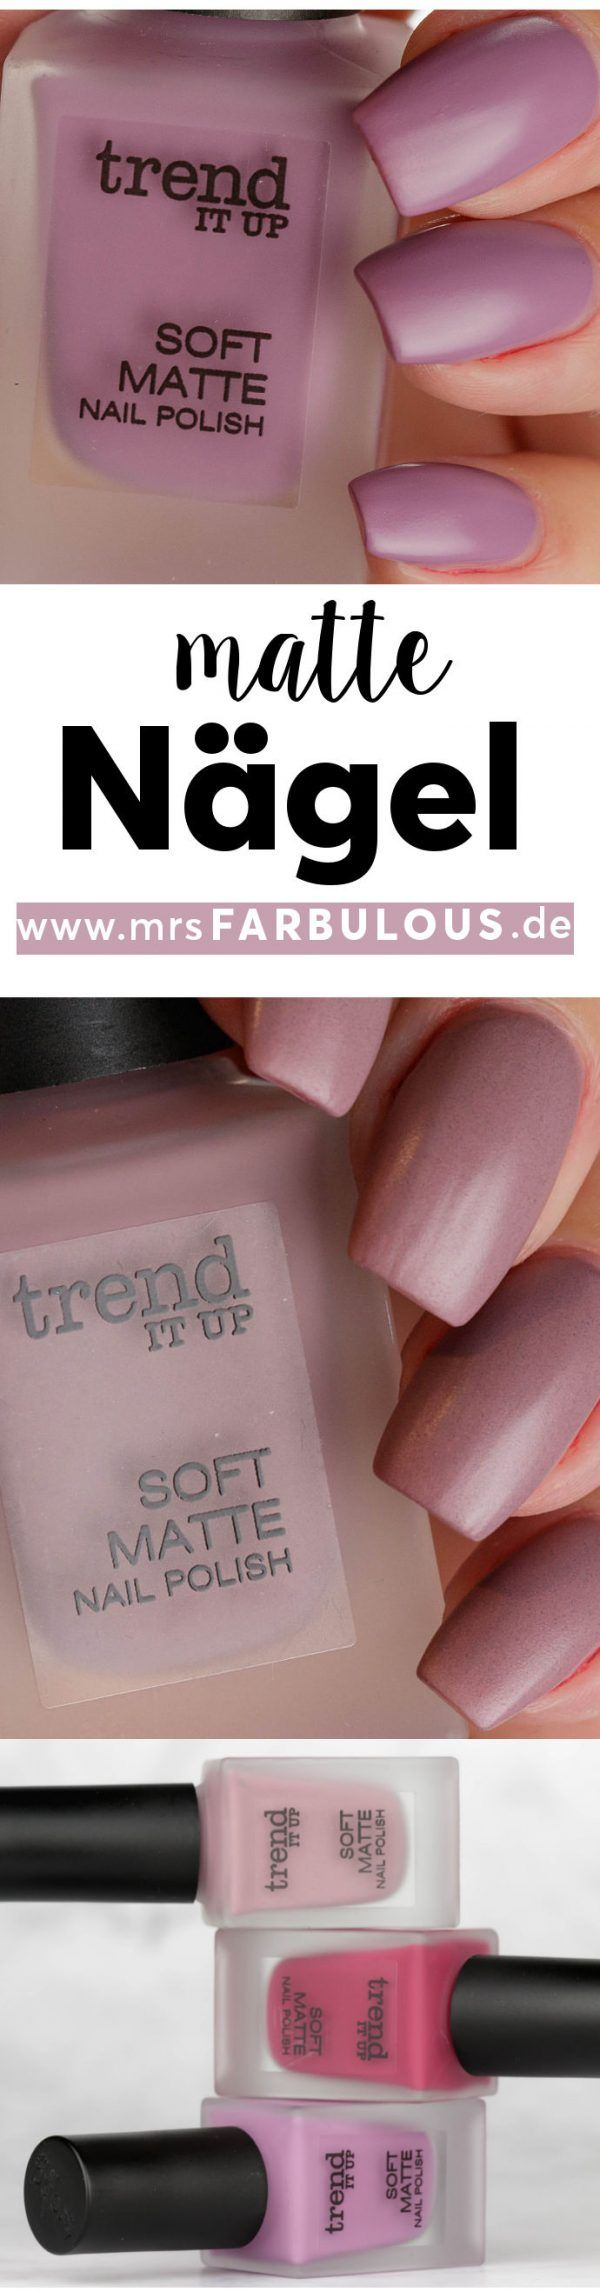 trend it up soft matte nagellack matte Nägel Drogerie Herbst 2